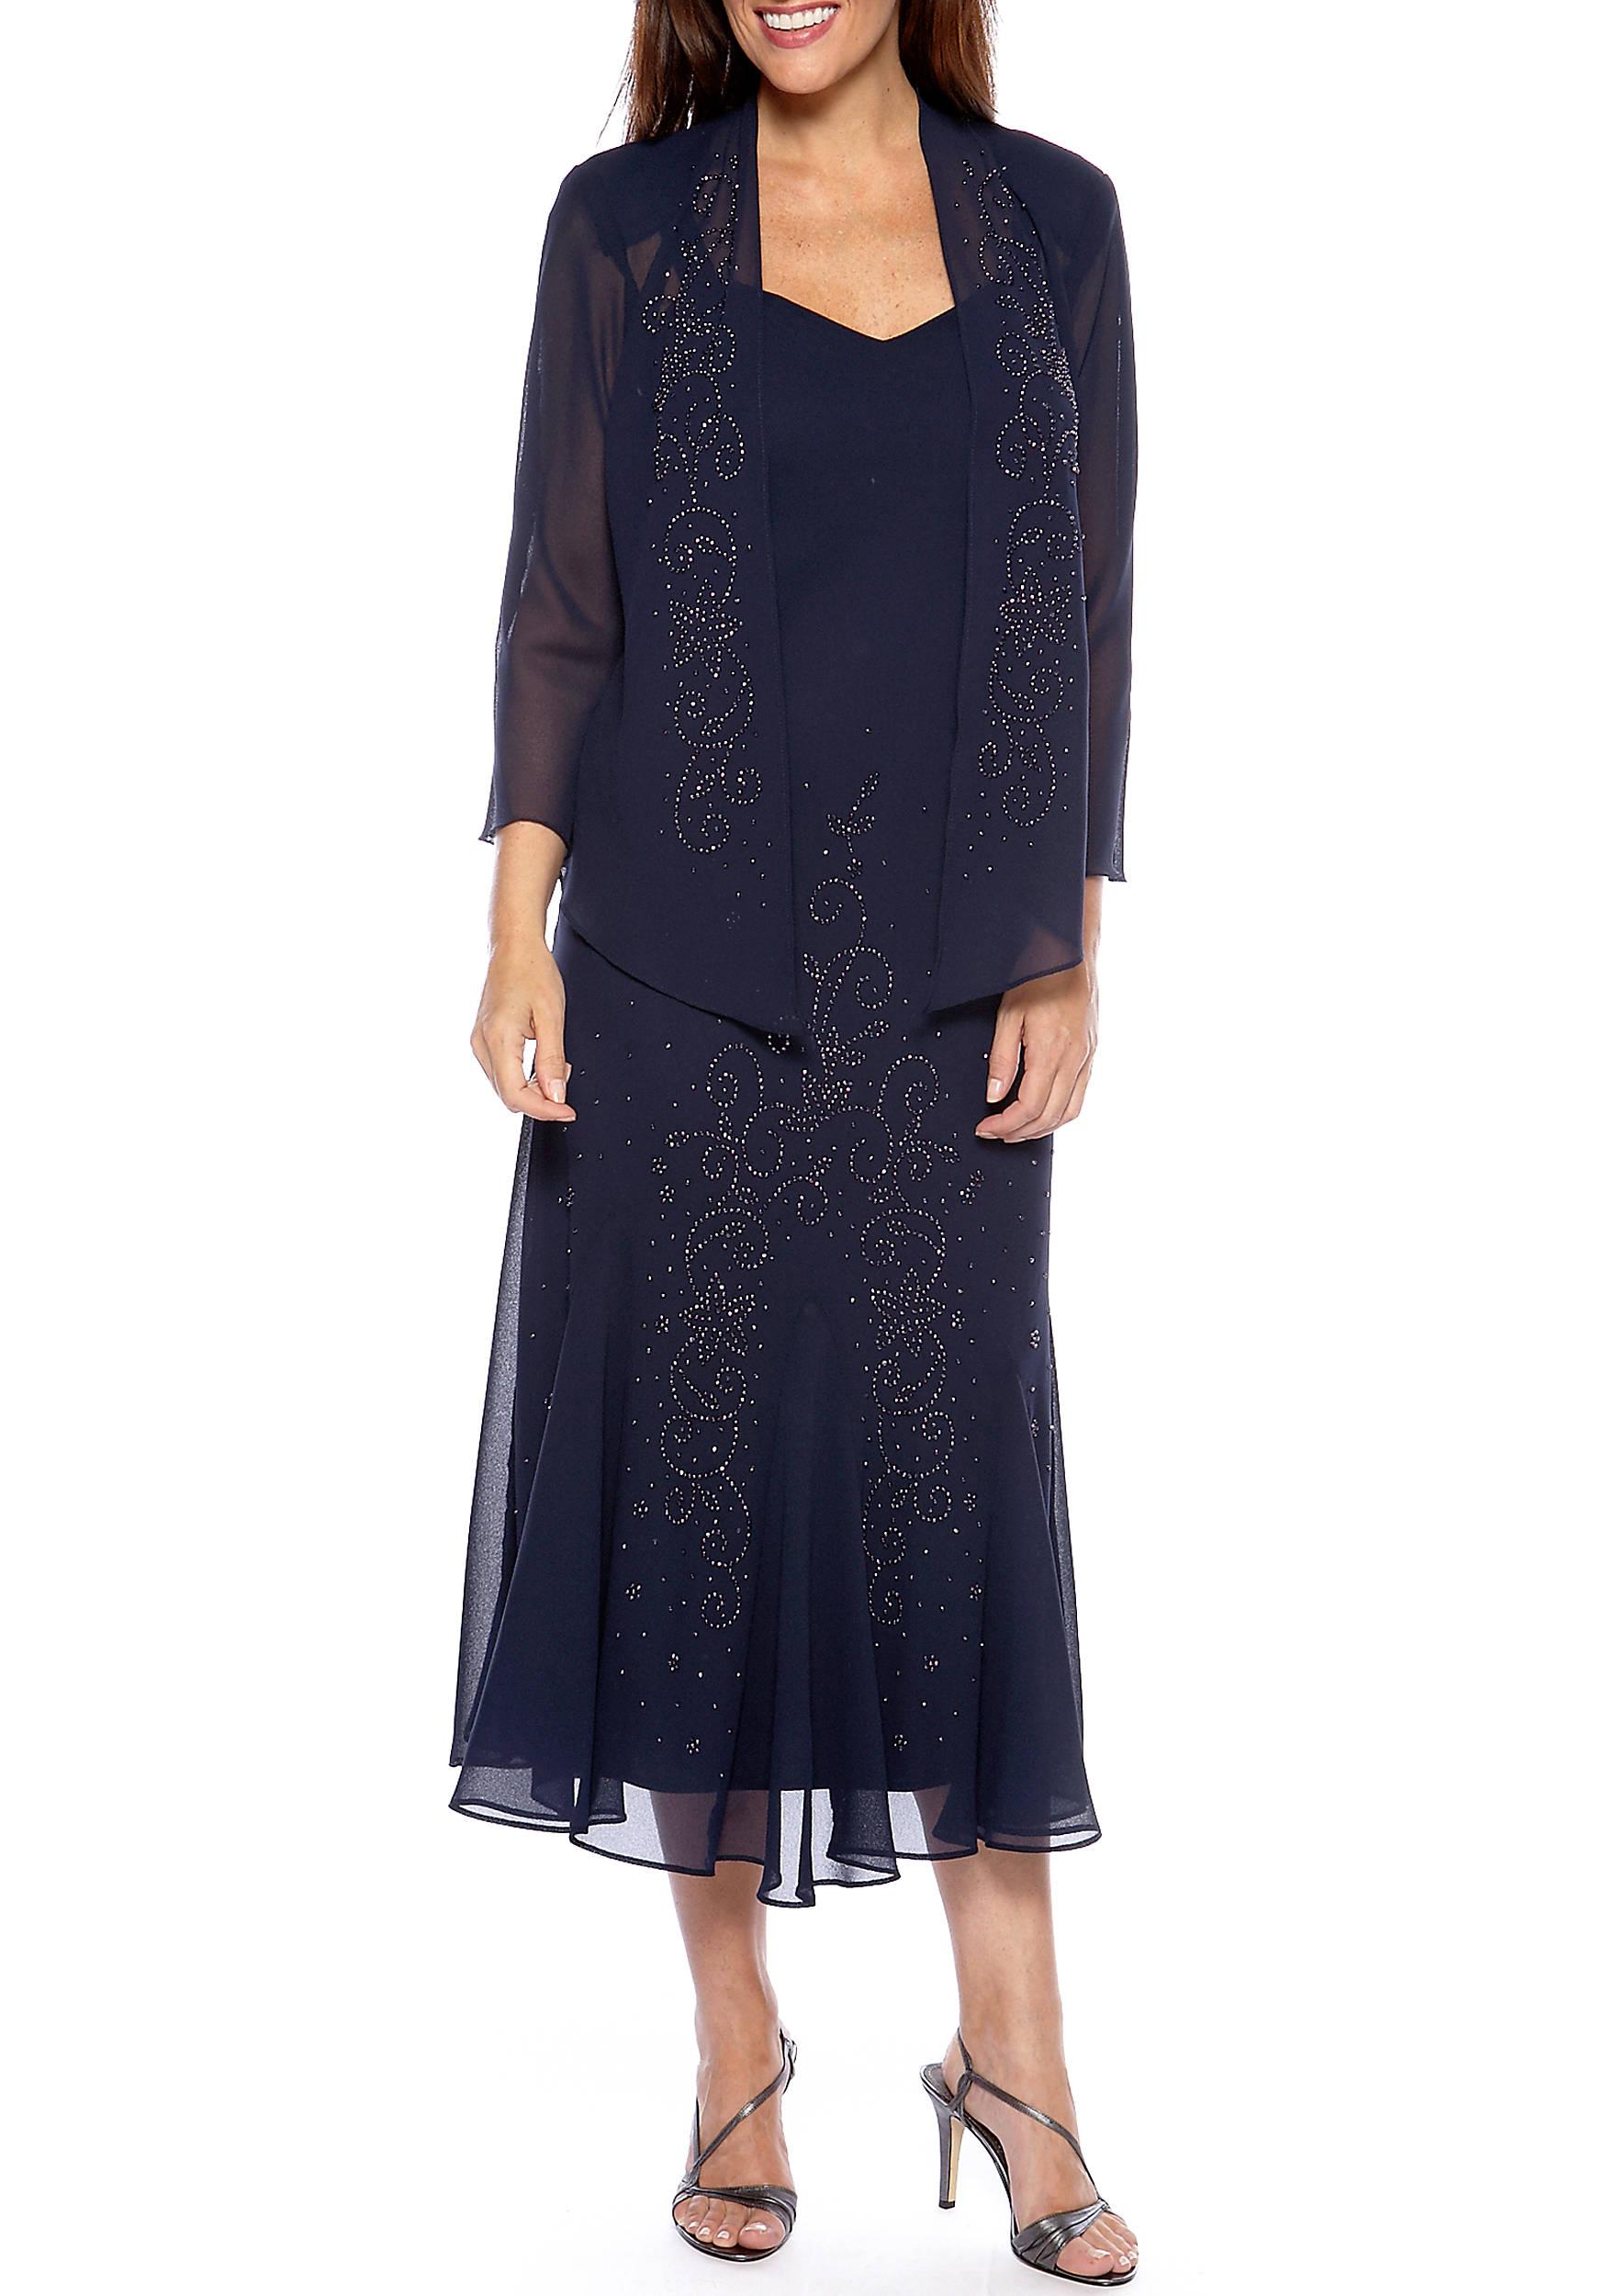 Black dress under knee - Sheer Beaded Jacket Dress